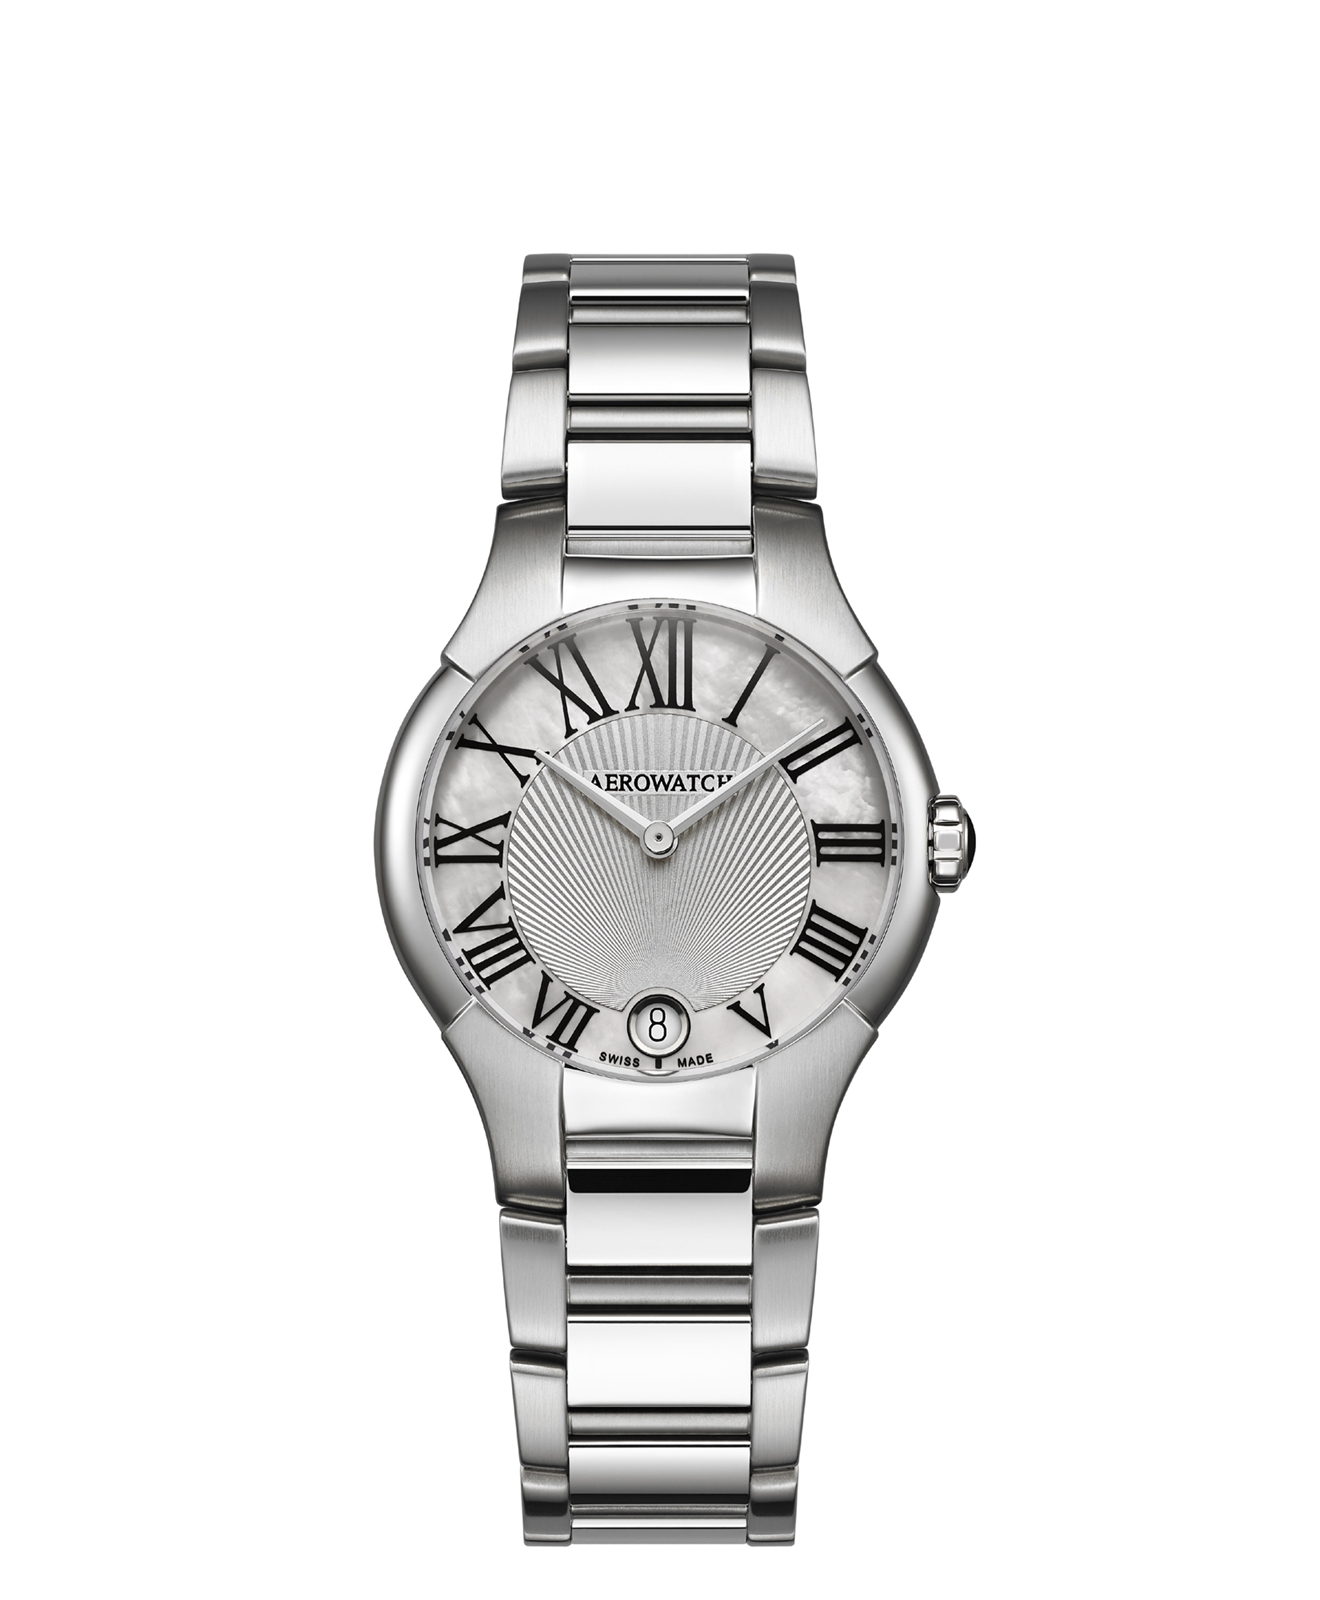 Aerowatch New Reloj Reloj Lady Reloj Aerowatch New Reloj Lady New Aerowatch Lady CBrsthQdxo